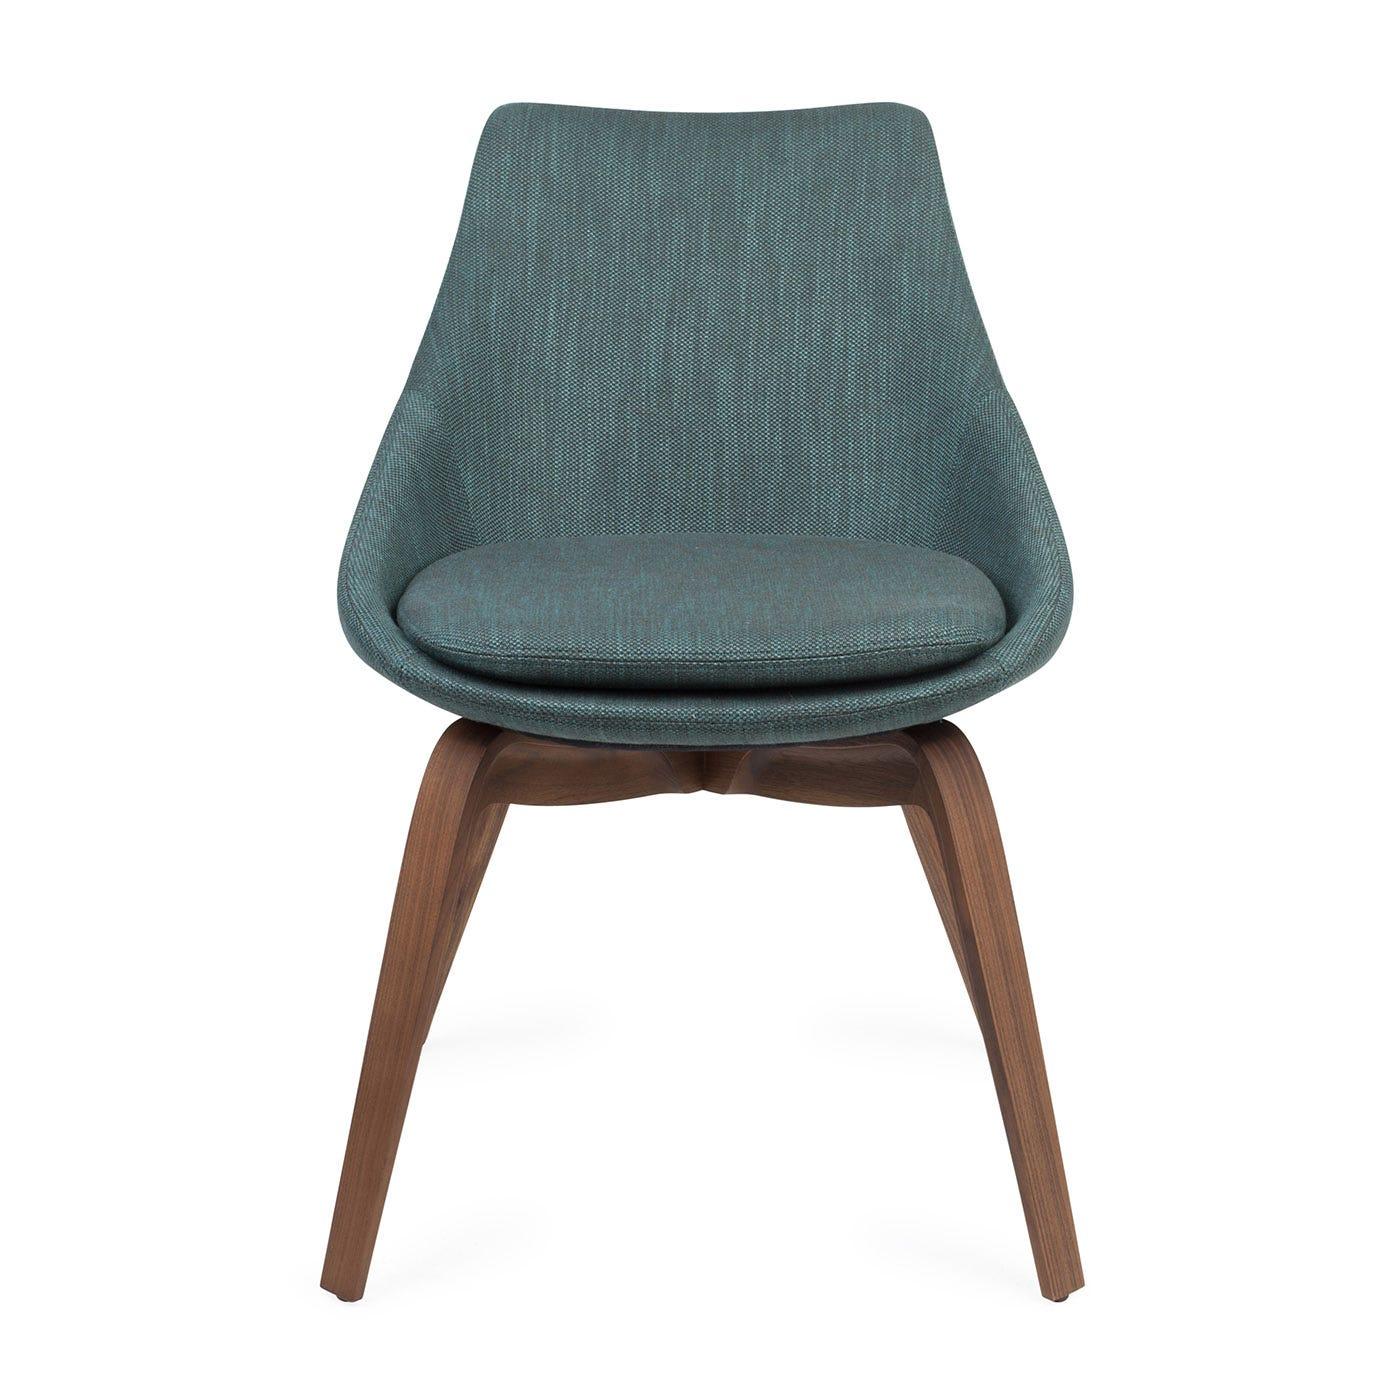 Penelope Chair Walnut Dorian 27